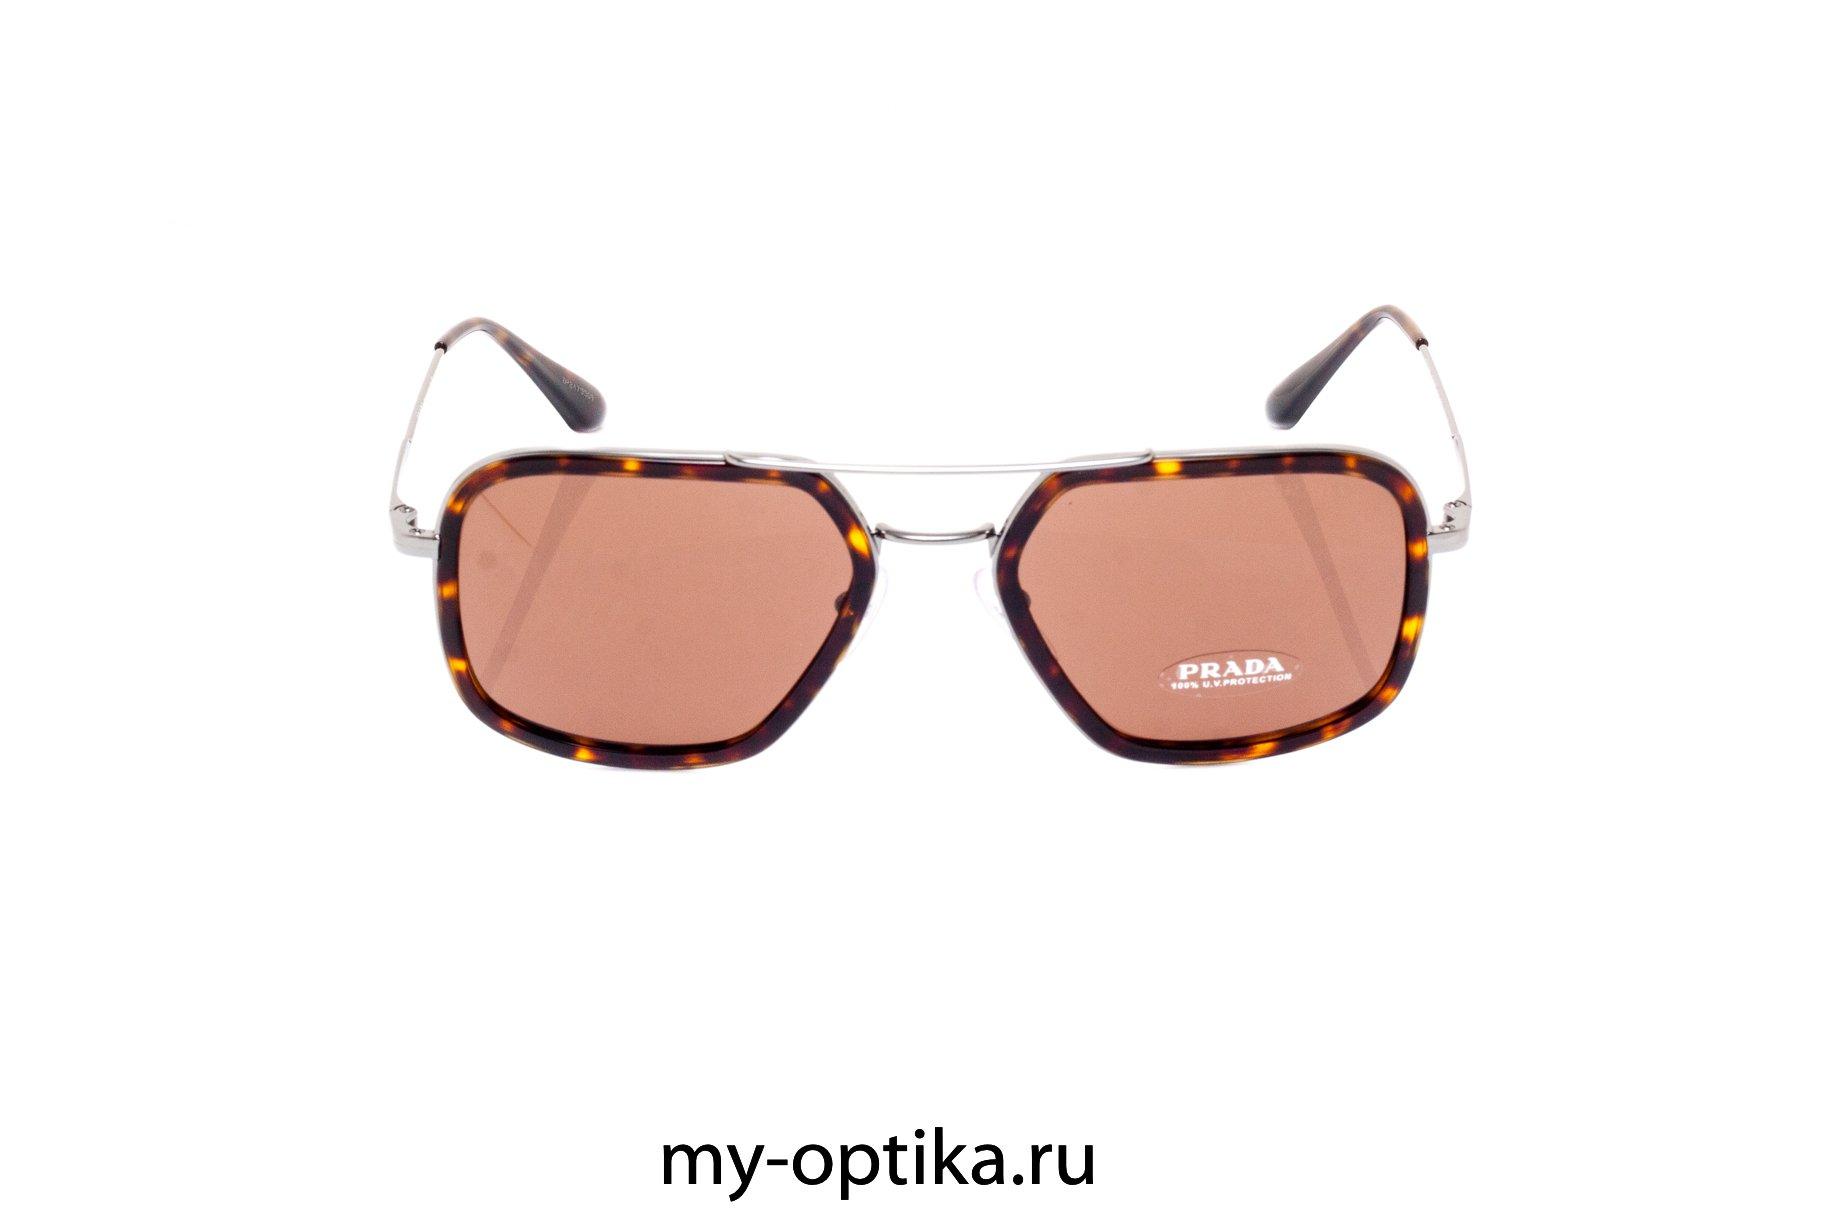 Очки Prada 57XS 01A/8C1